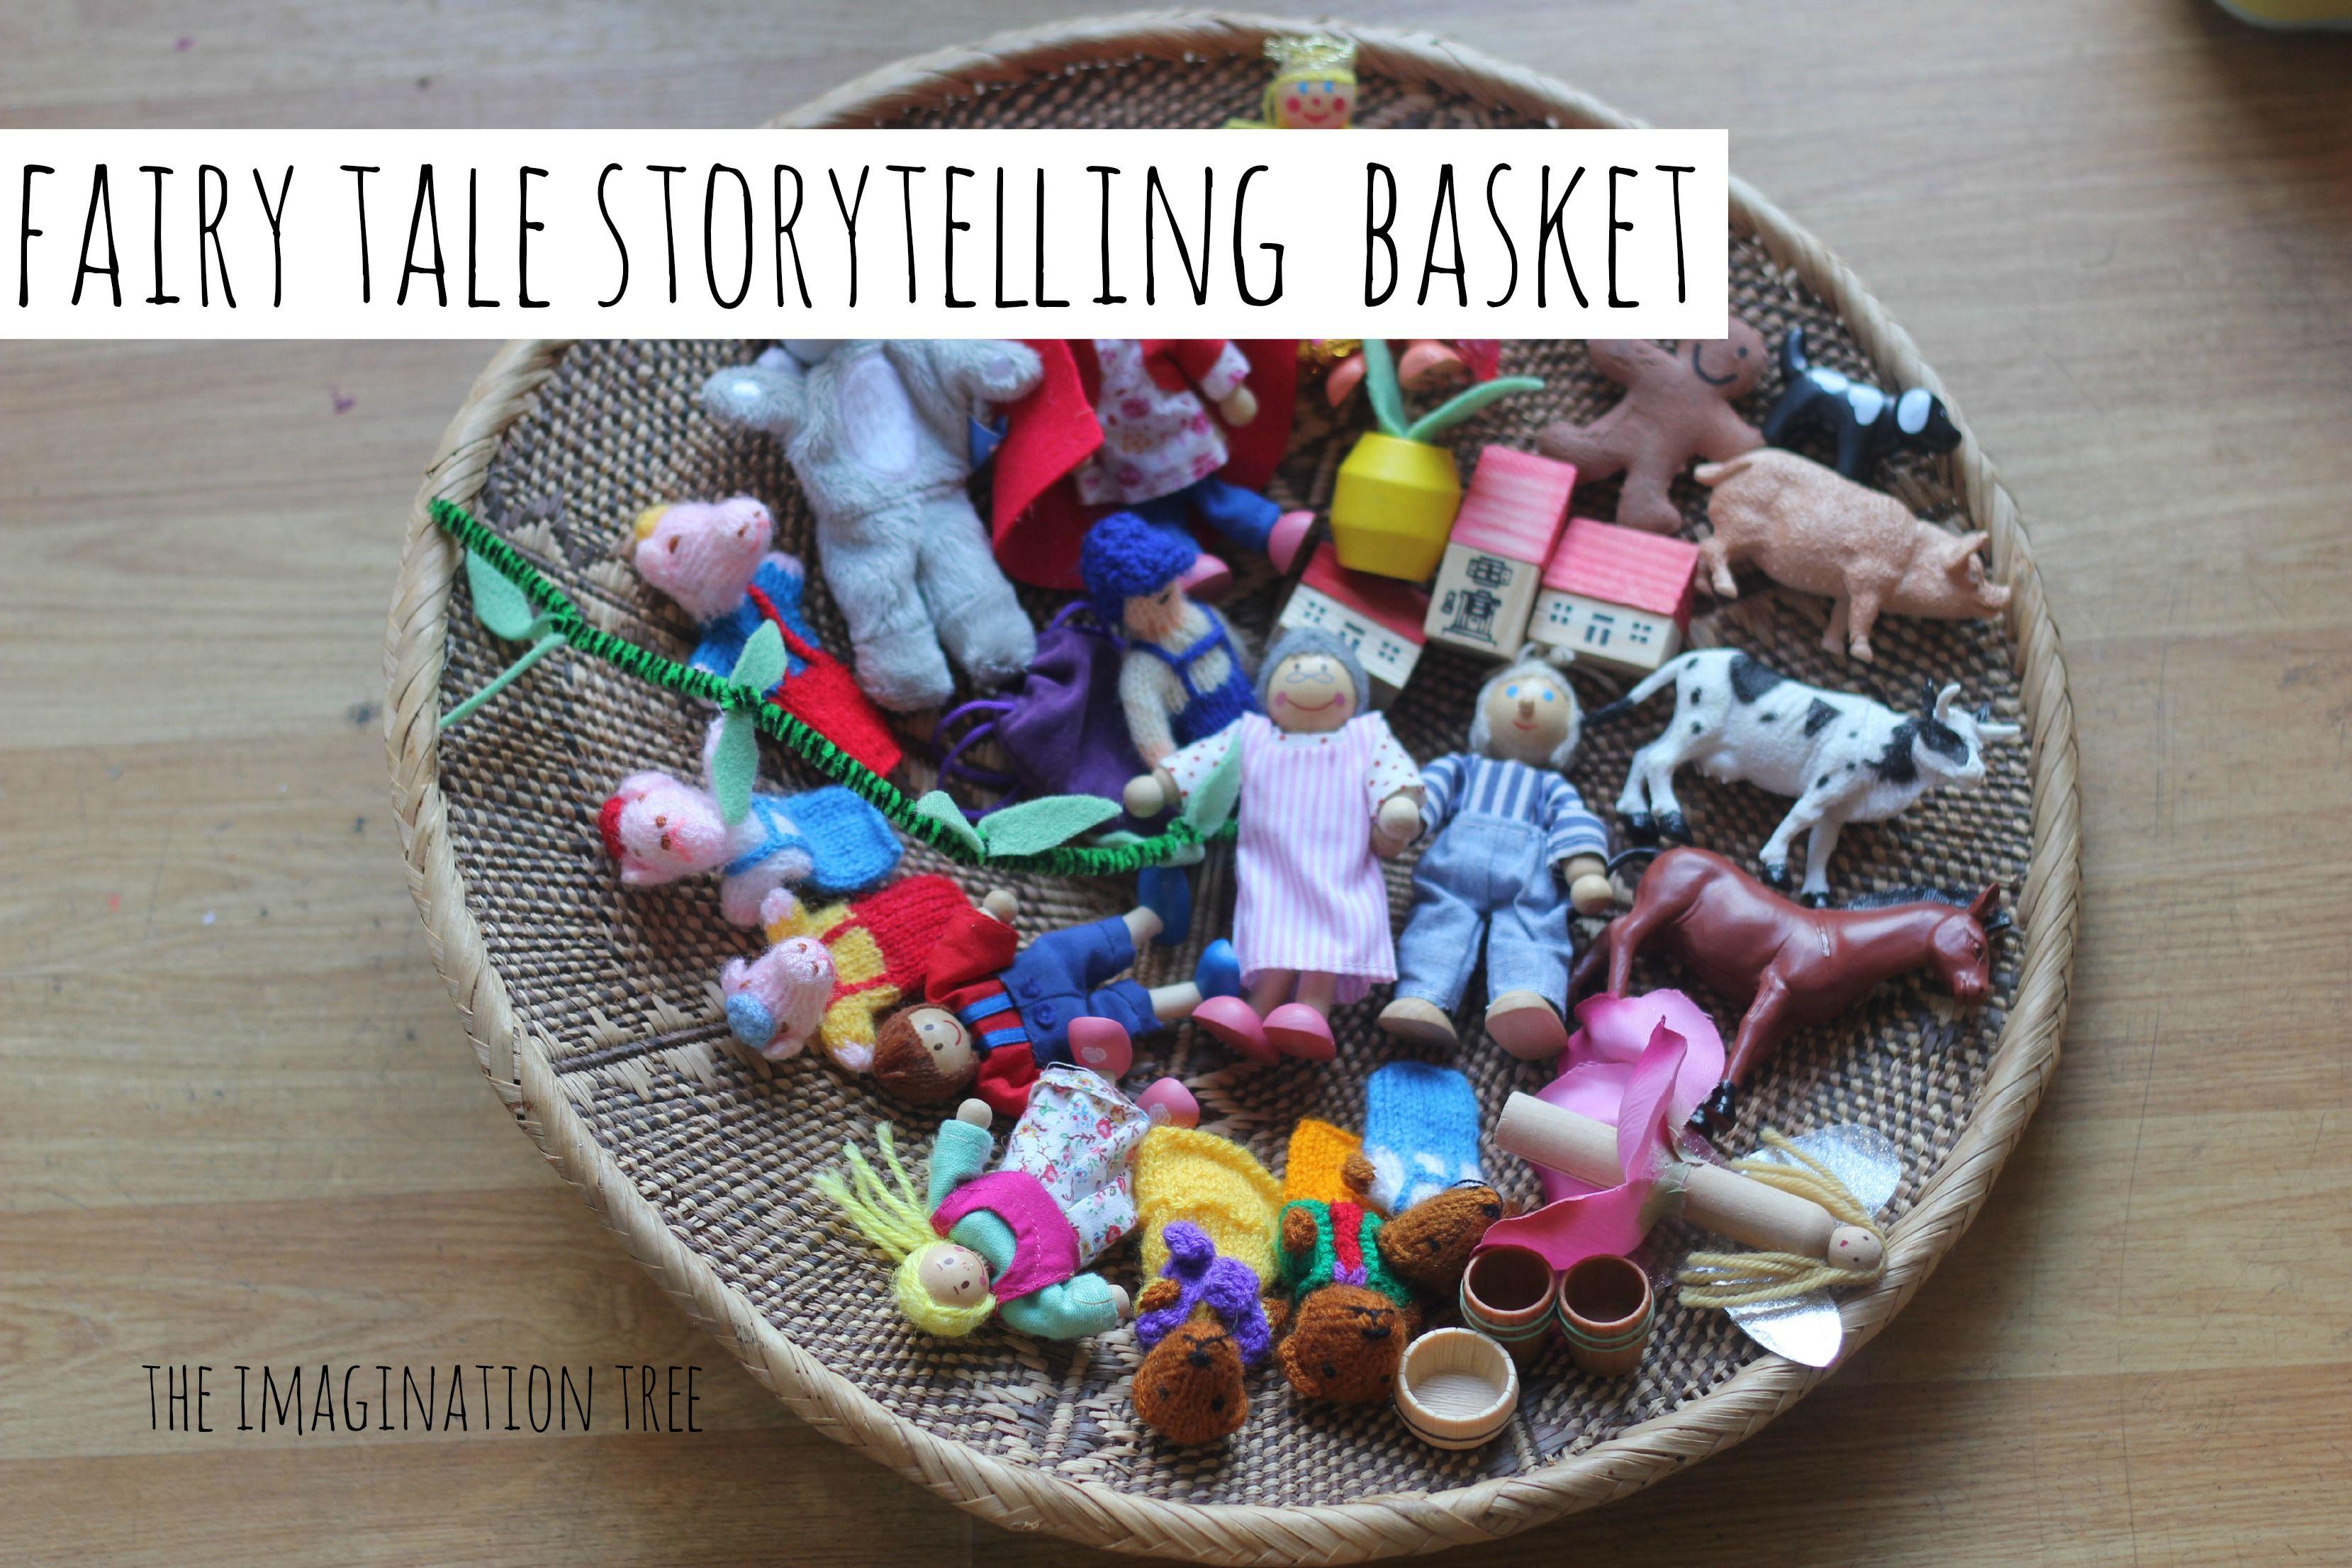 Fairytale Storytelling Basket